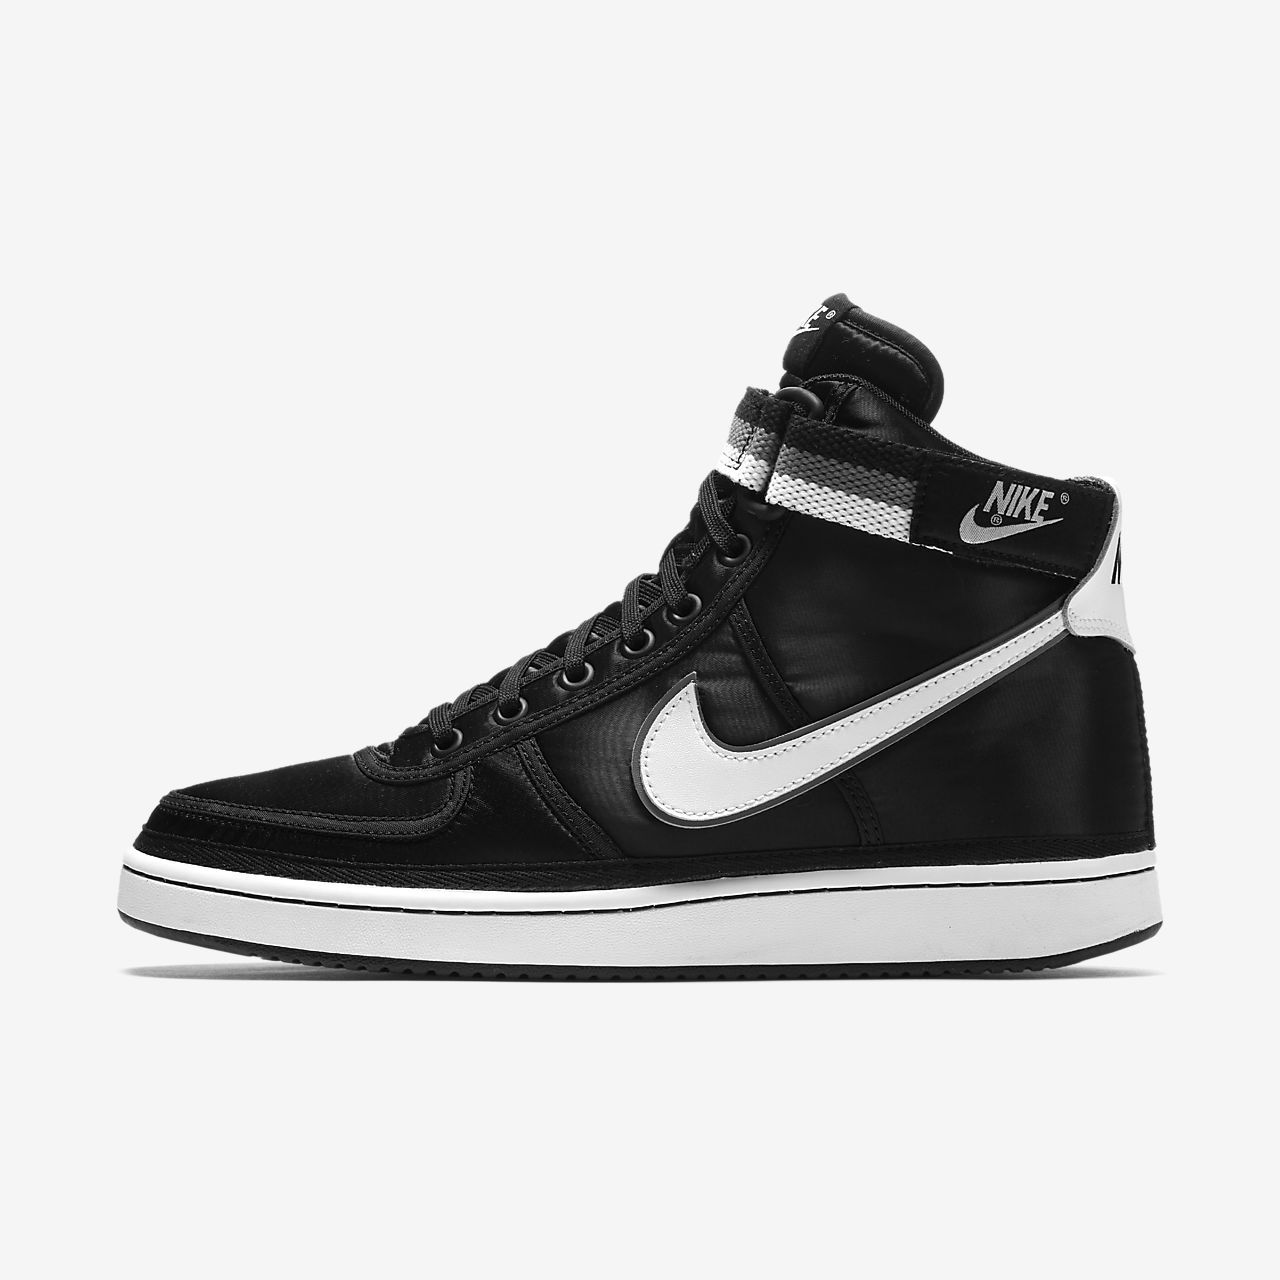 Nike Vandal High Supreme Men's Lifestyle Shoes White qC8312Q